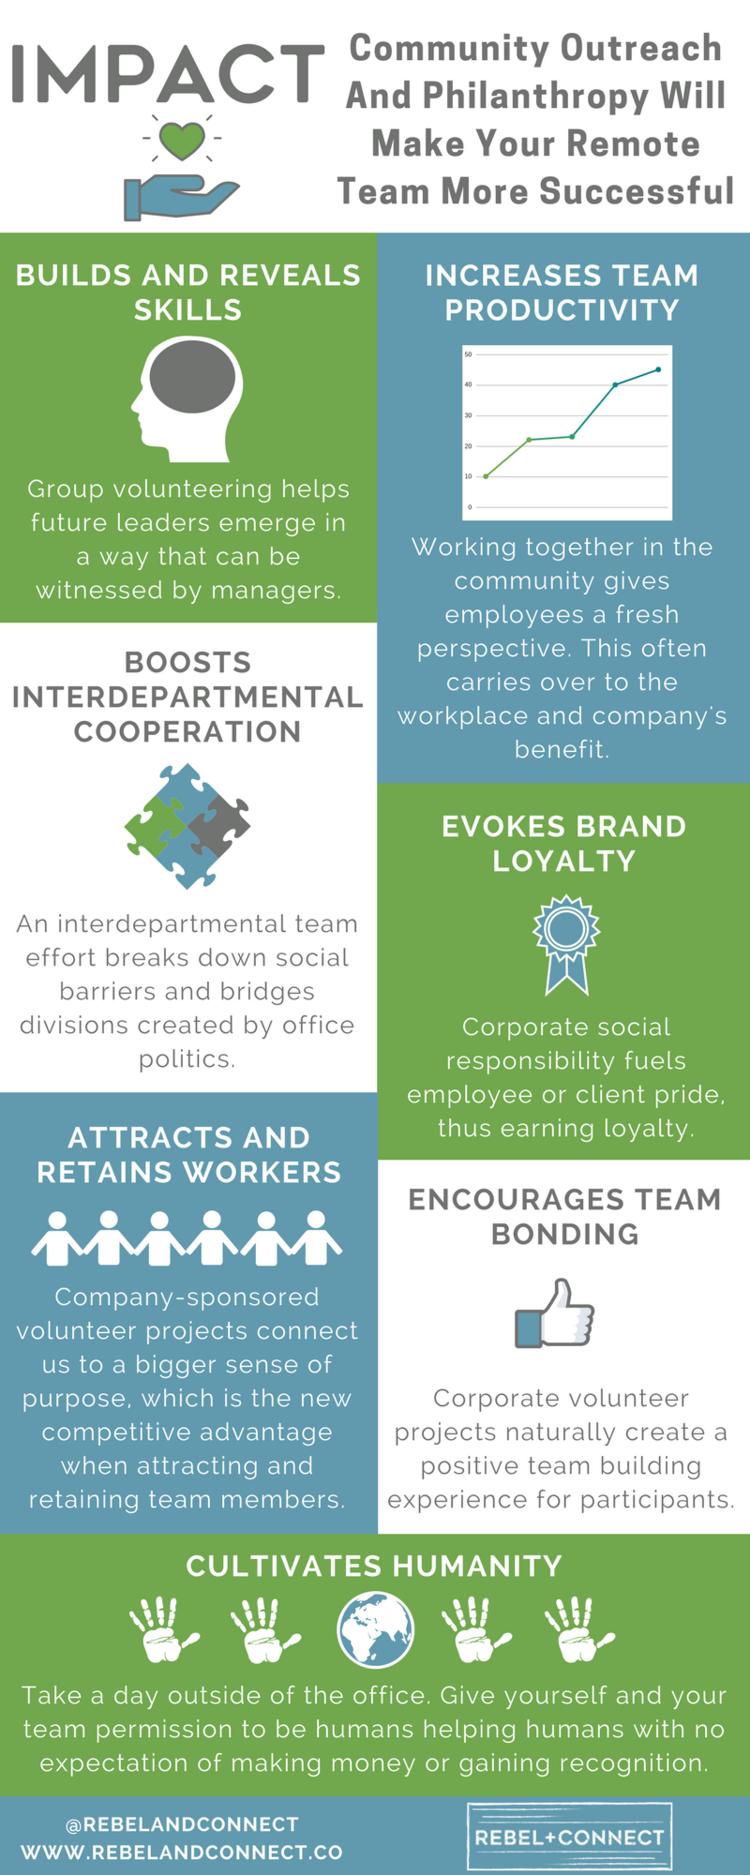 Use community service to strengthen remote team bonds.